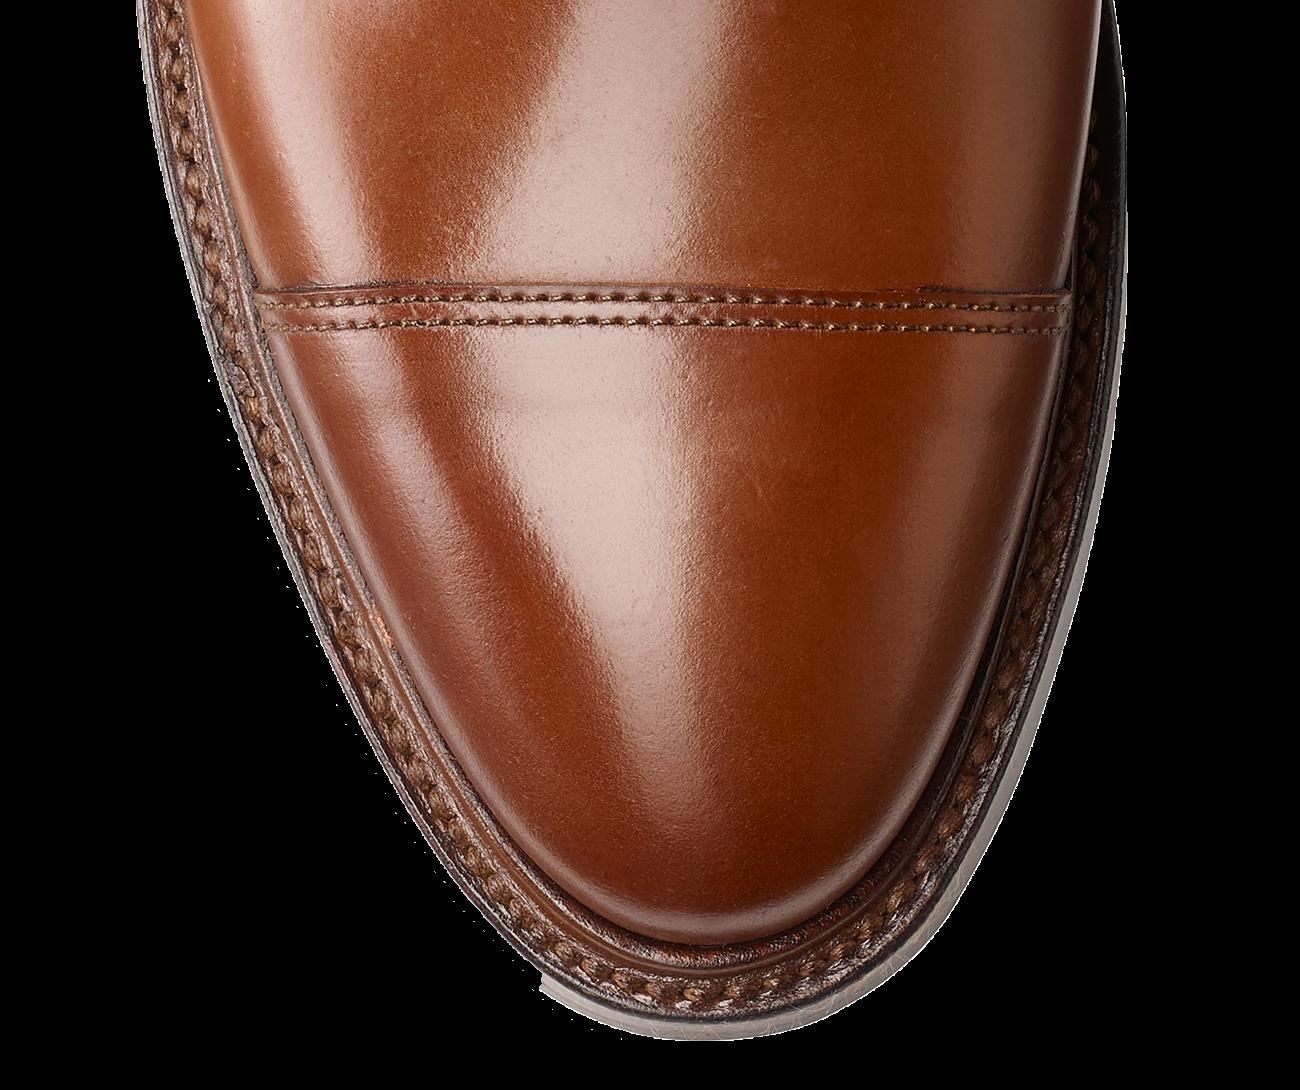 Harlech Jones Y Zapatos Whisky Trajes CordovanCrockettamp; sQCdBtrhx